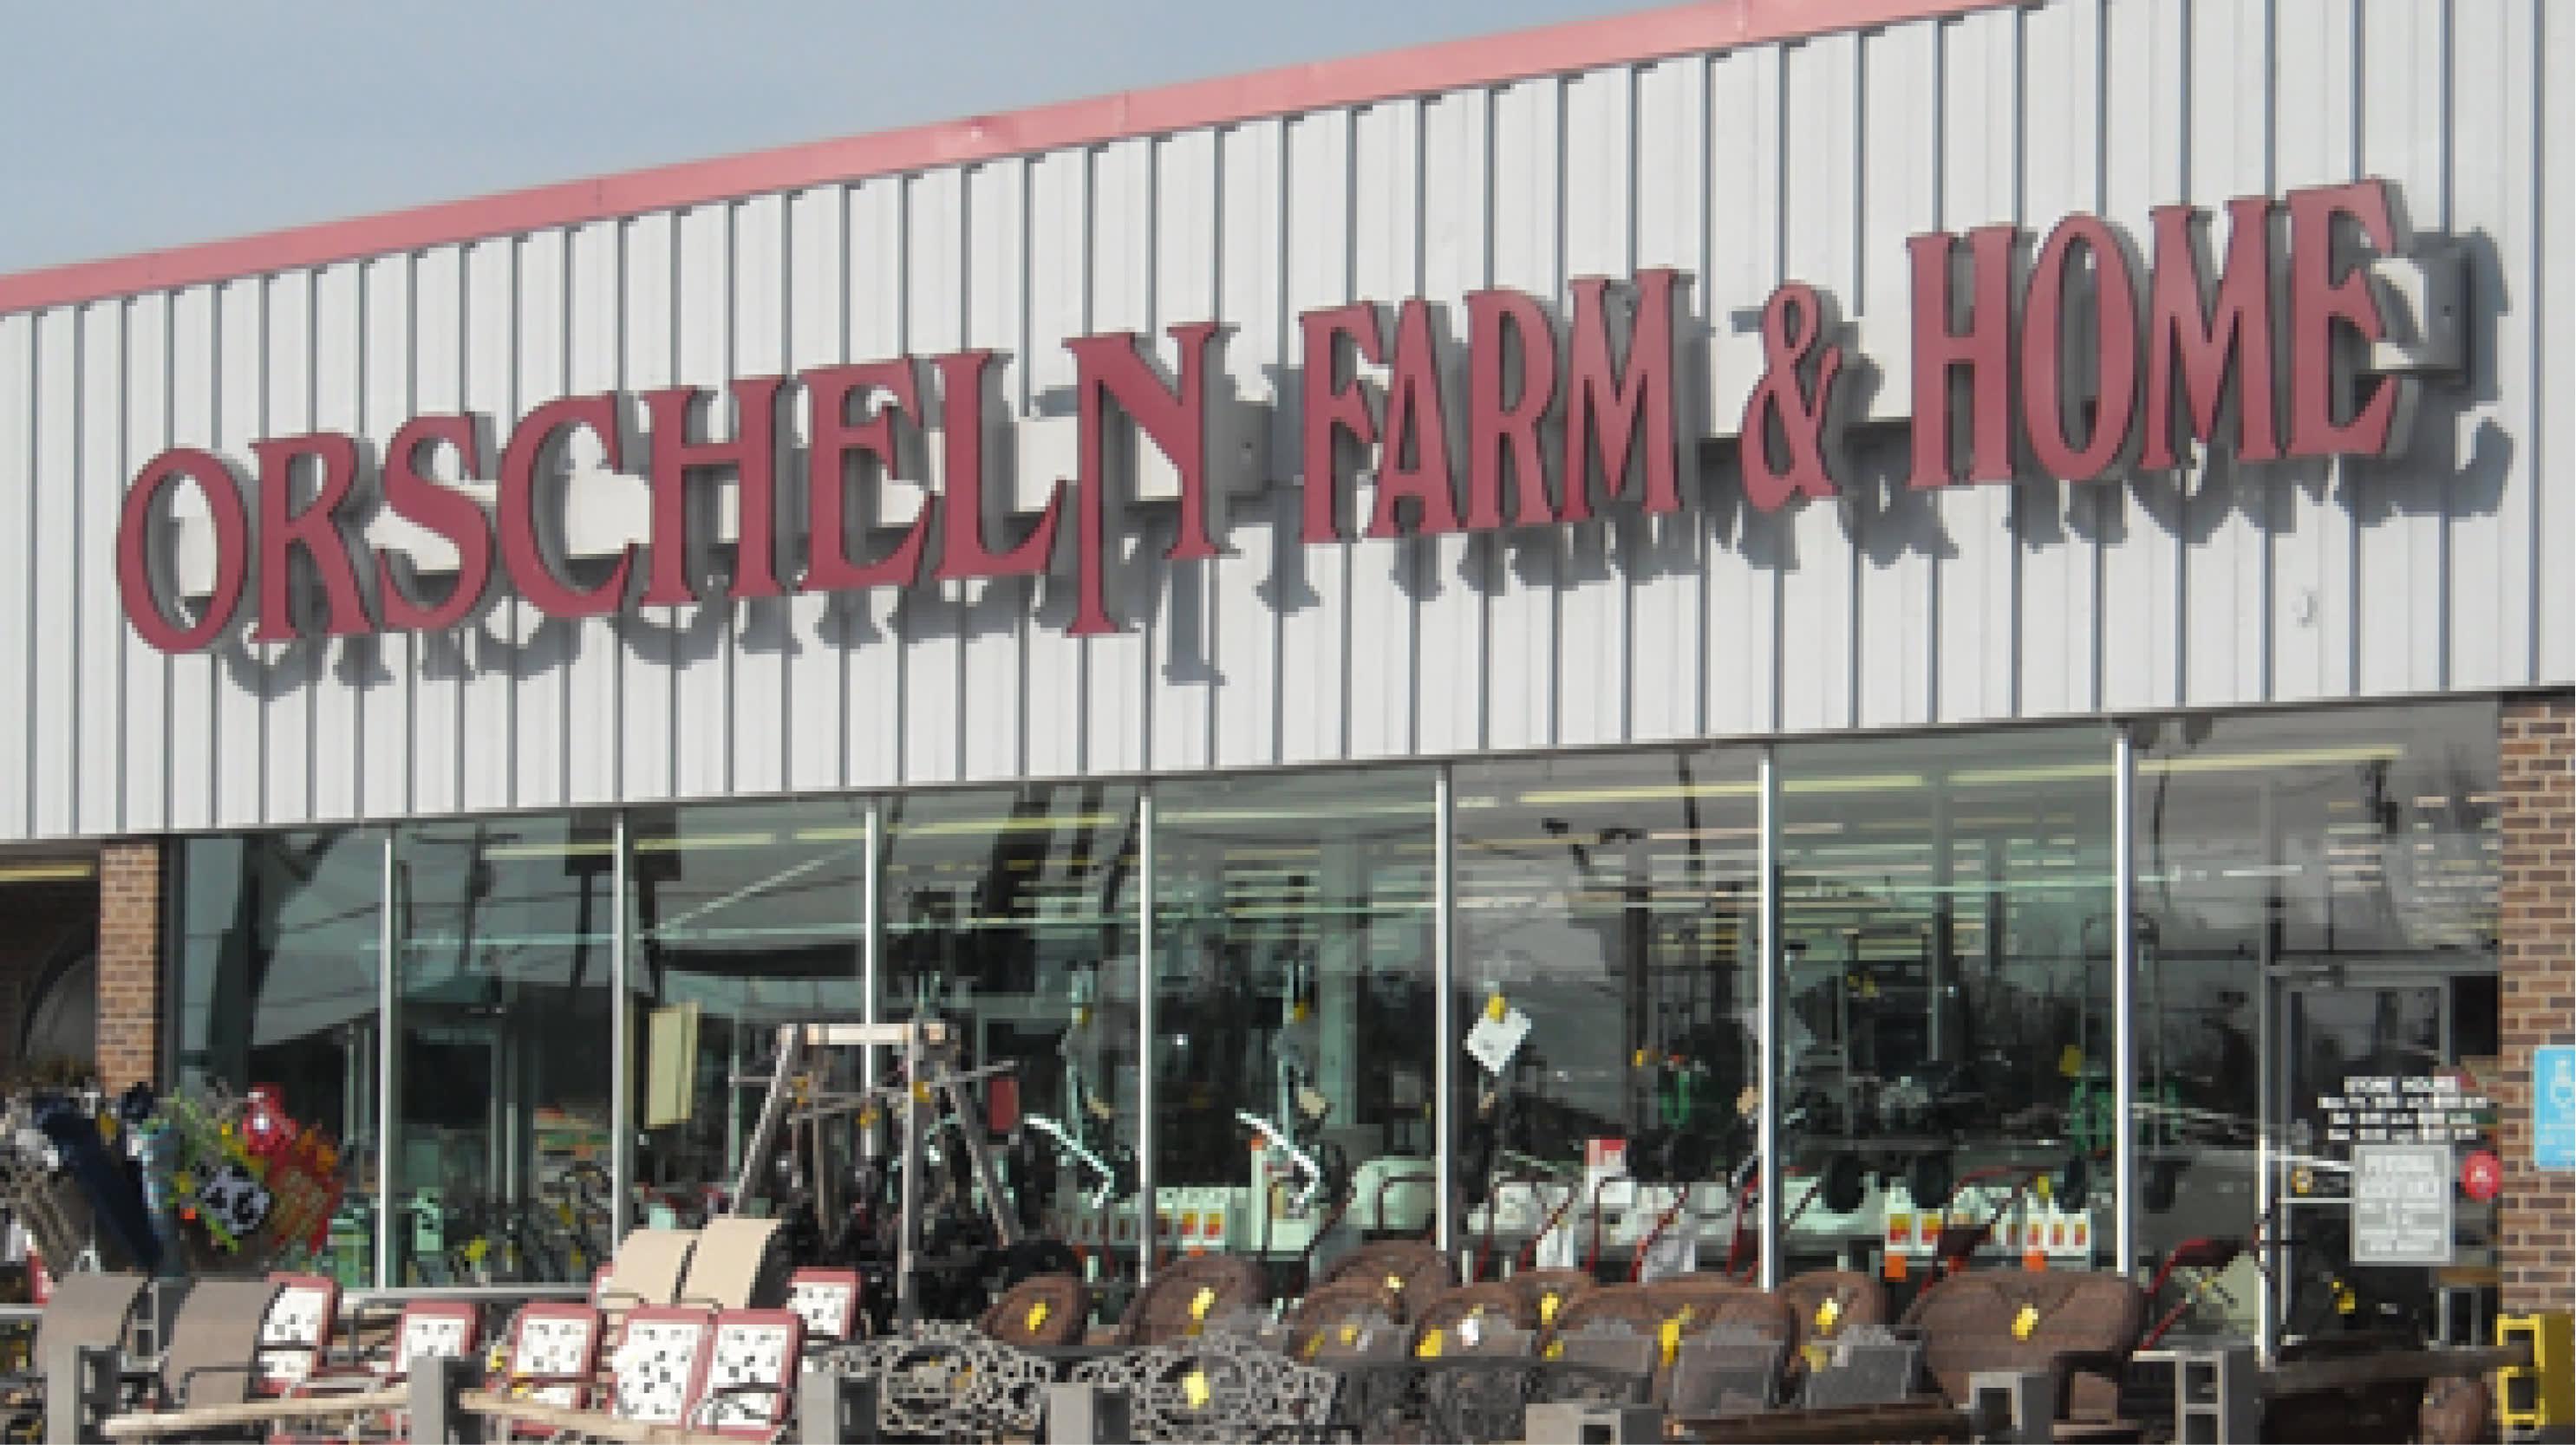 Front view of Orscheln Farm & Home Store in Macon, Missouri 63552